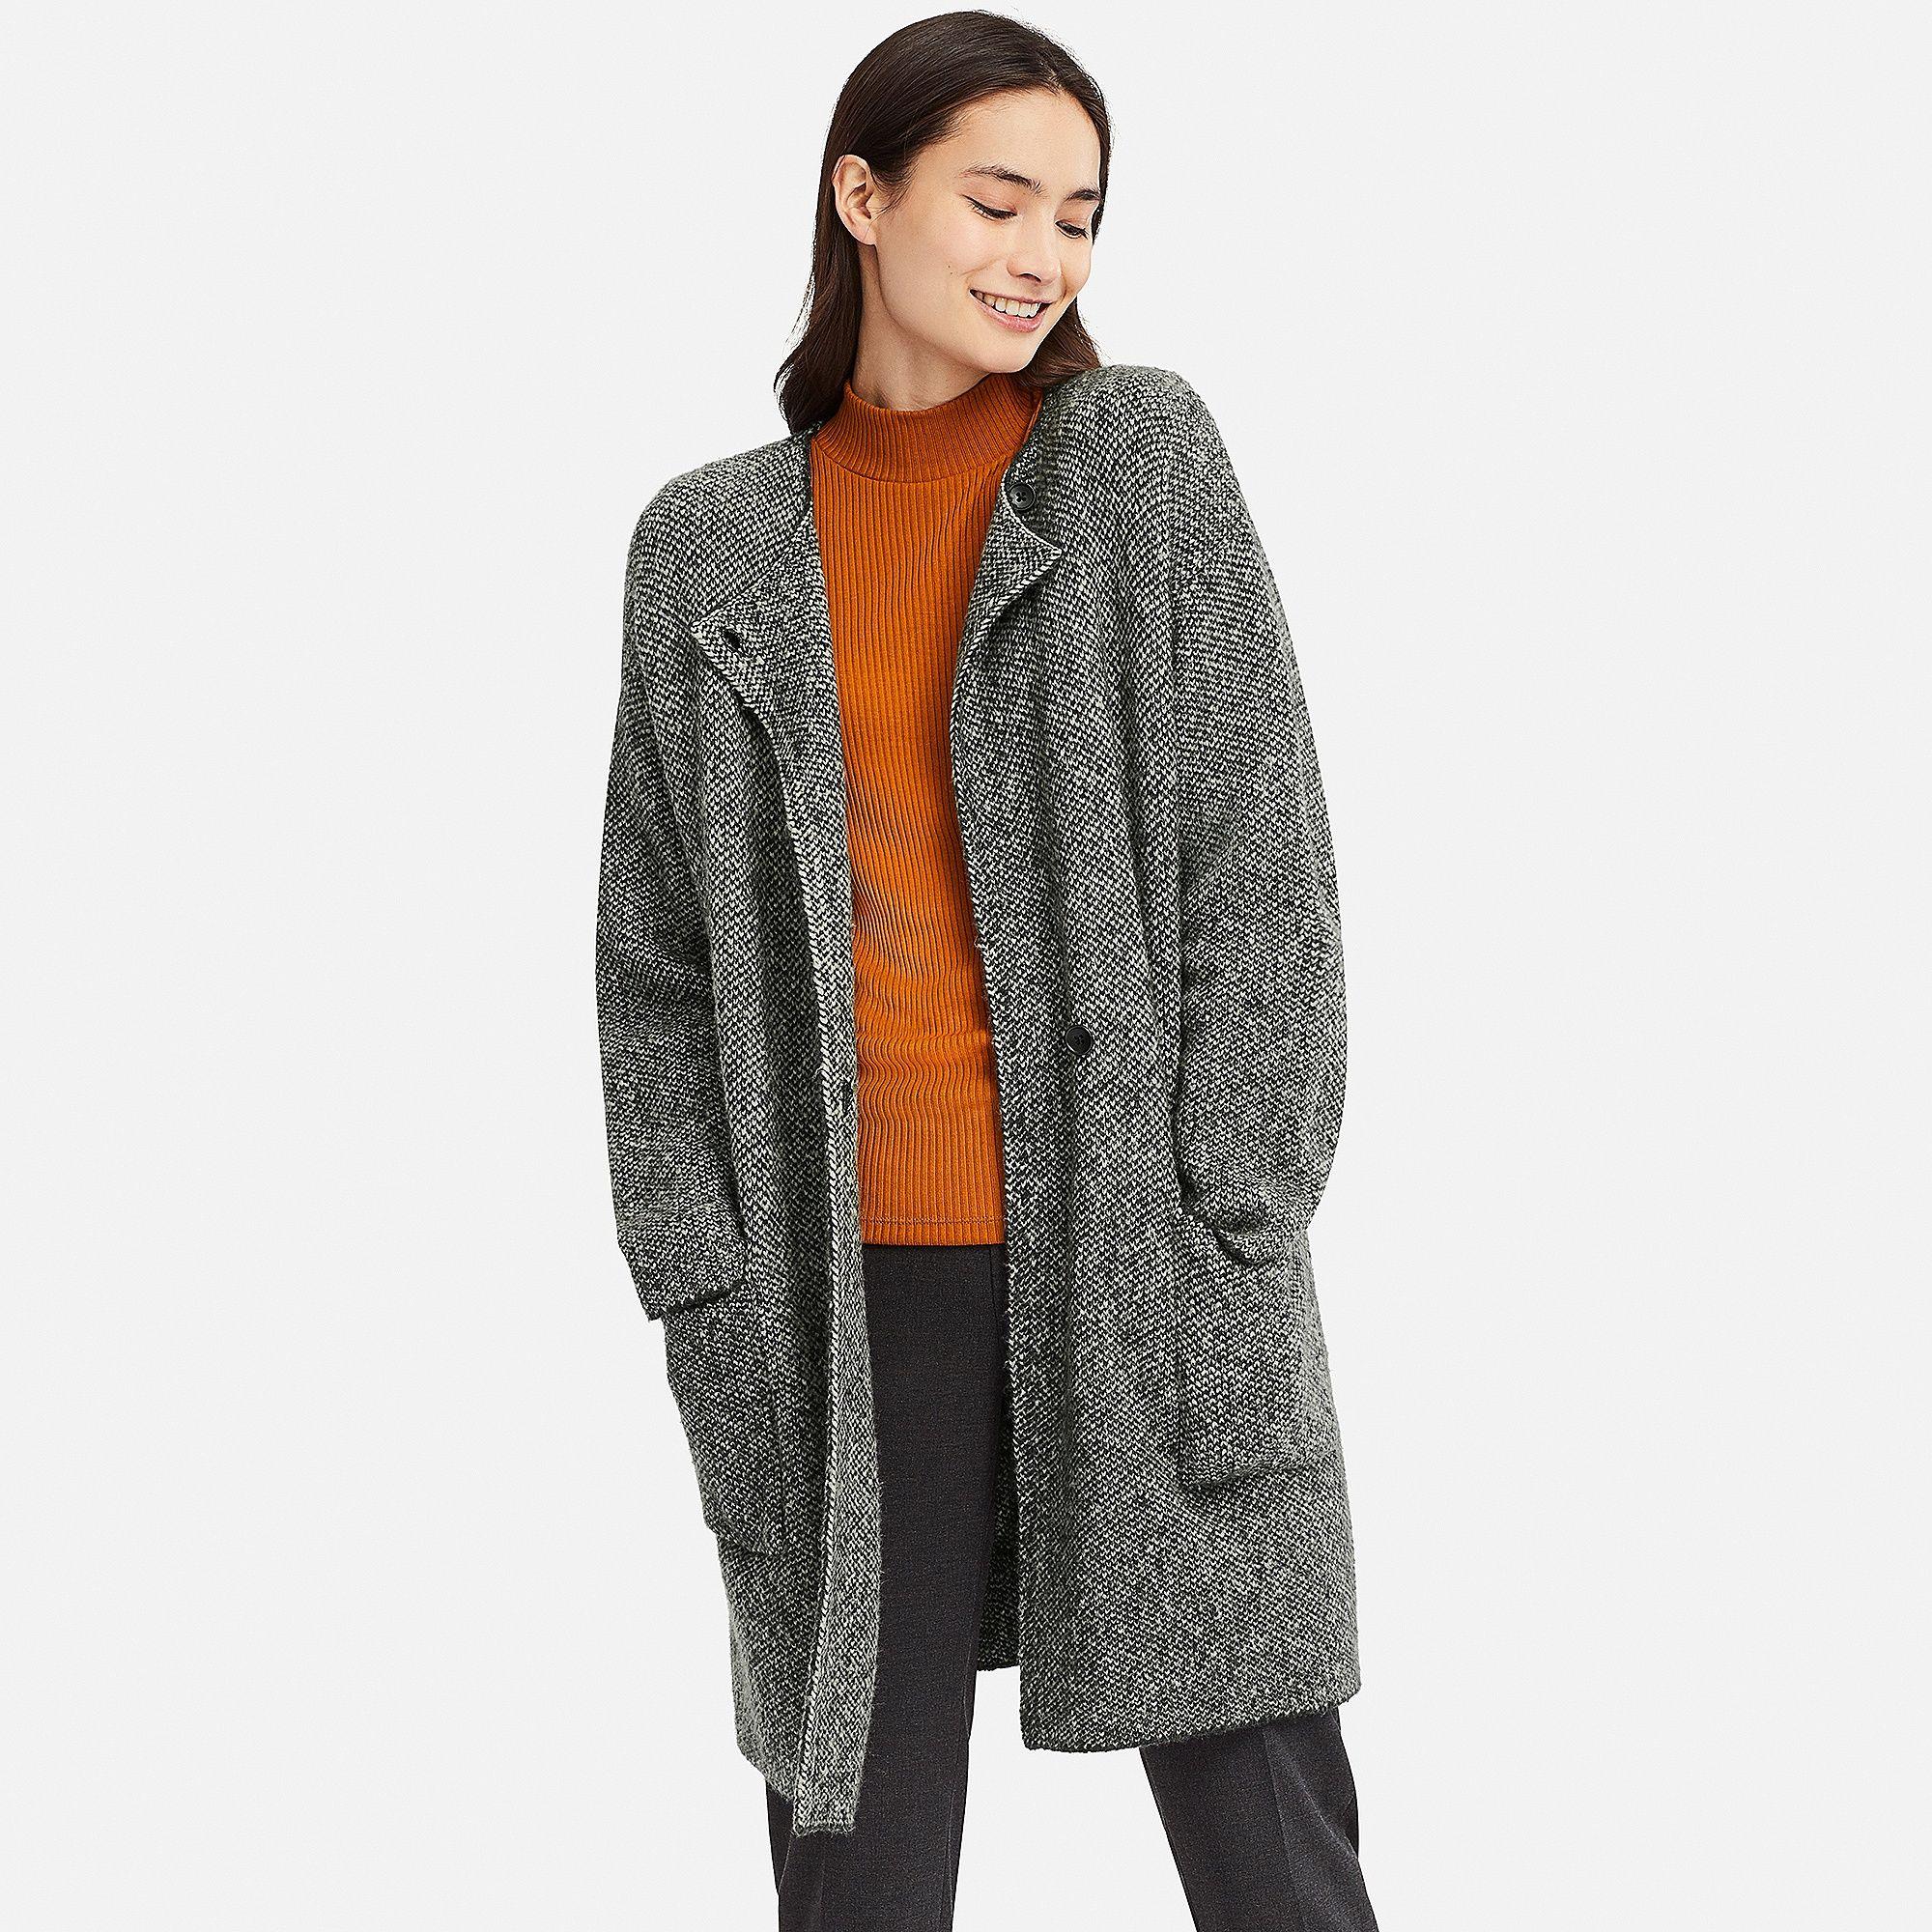 Women Tweed Knitted Coat Uniqlo Uk Knitted Coat Coats Jackets Women Stylish Outerwear [ 2000 x 2000 Pixel ]